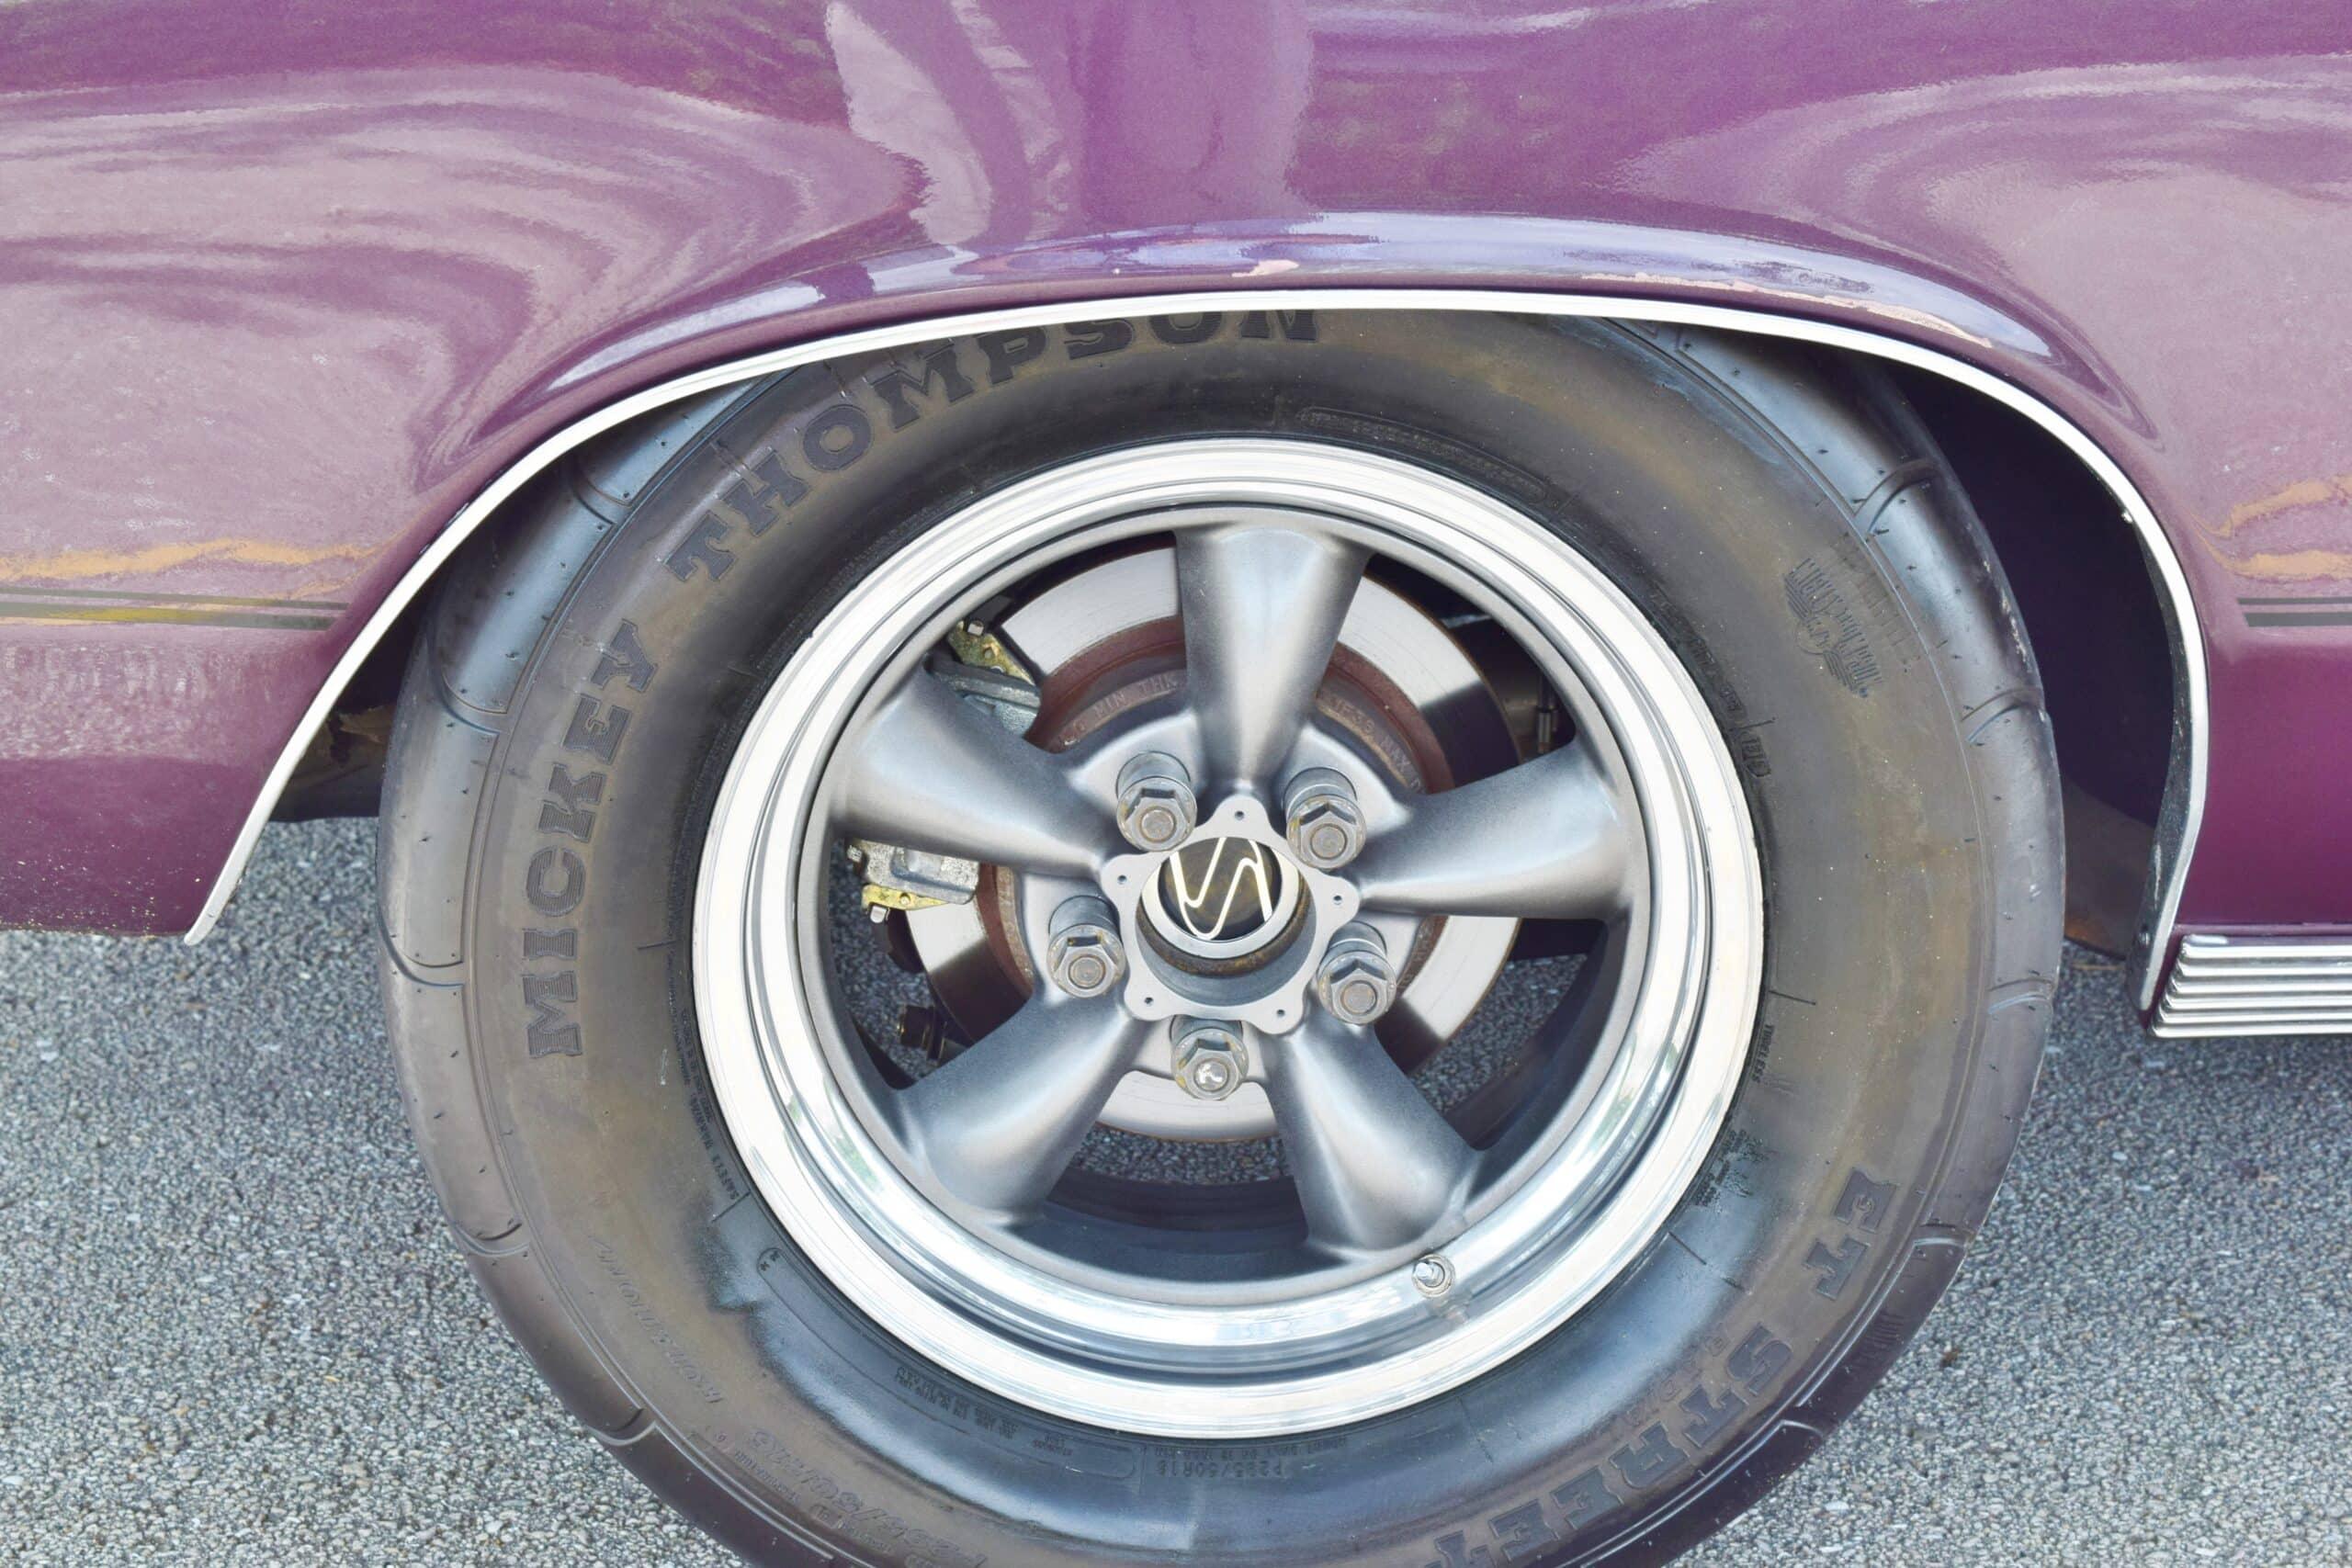 1967 Chevrolet Chevelle Malibu SS 632CI CHEVELLE STREET CAR 632 C.I. 10 LITER / 1000 HP TURBO 400 WITH OVER DRIVE